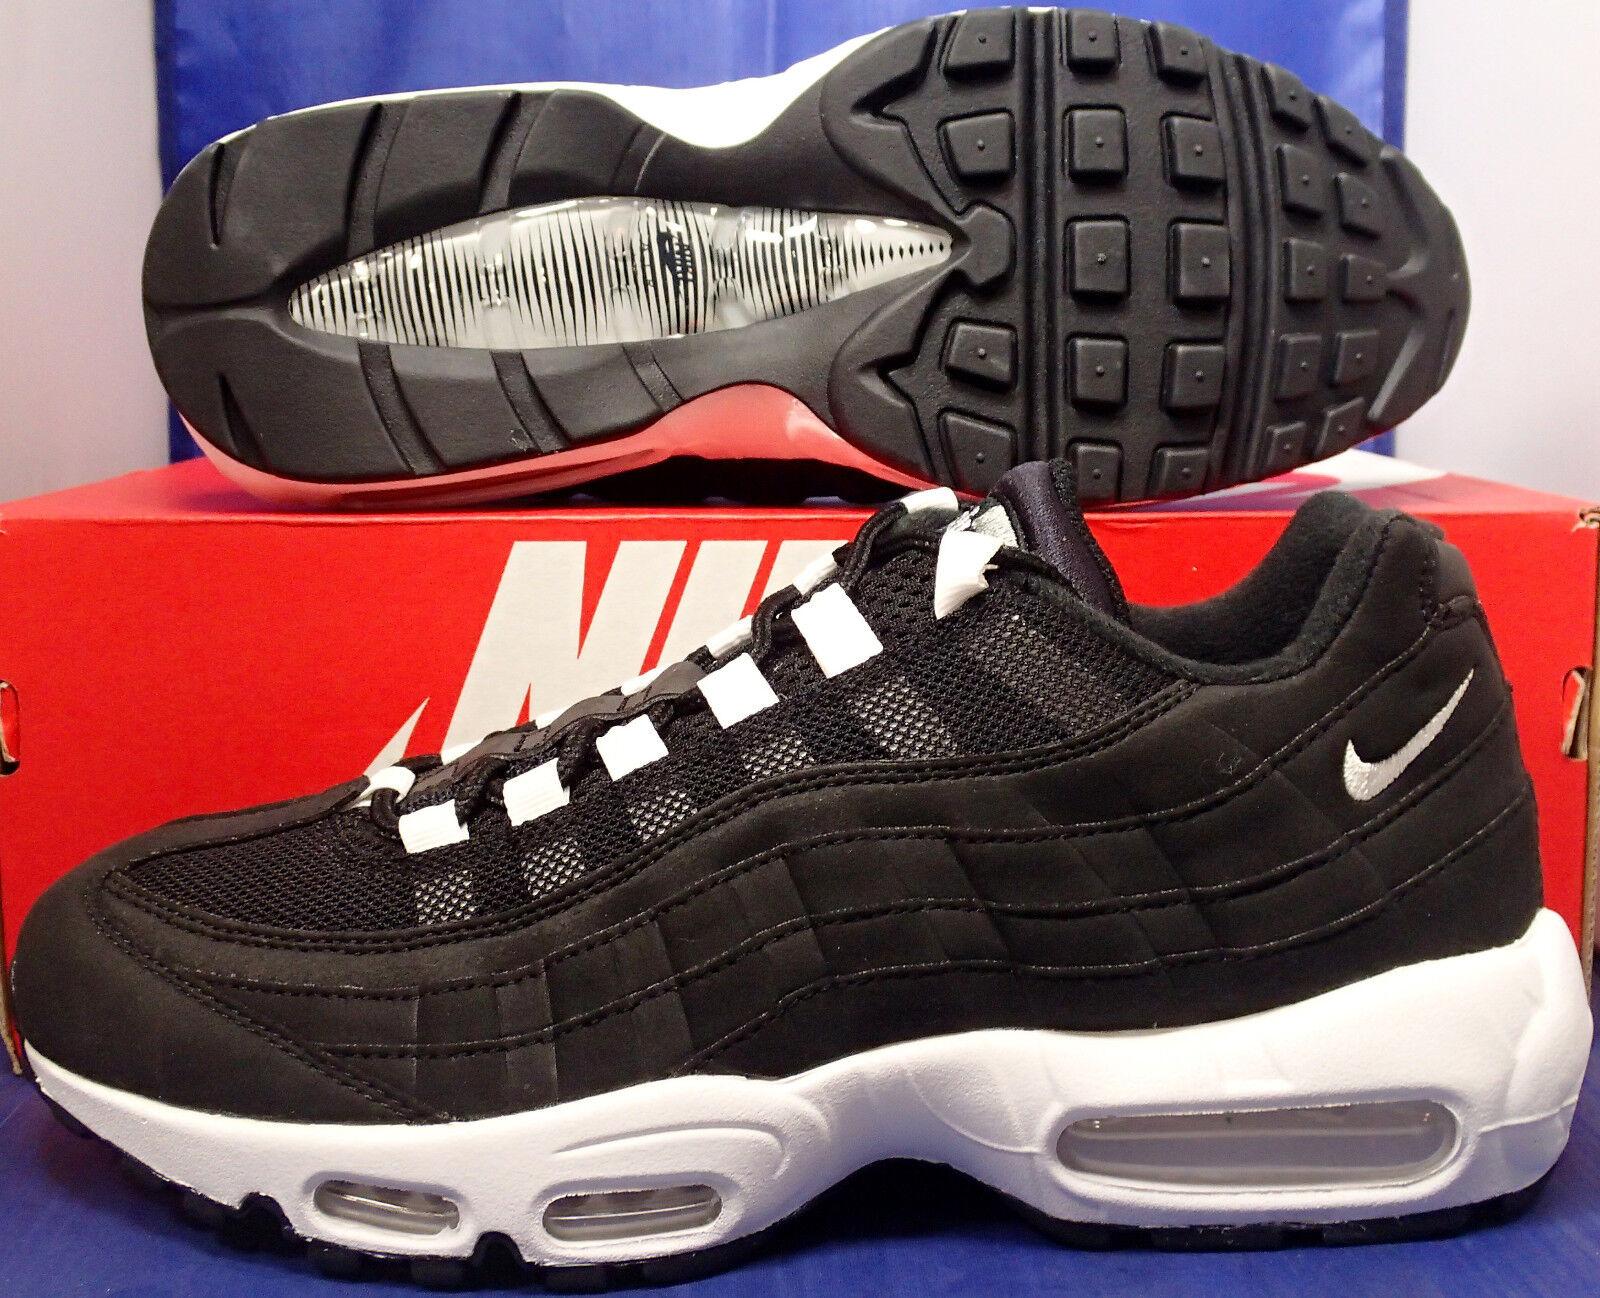 Nike Air Max 95 iD Black White SZ 8.5 ( 818592-993 )